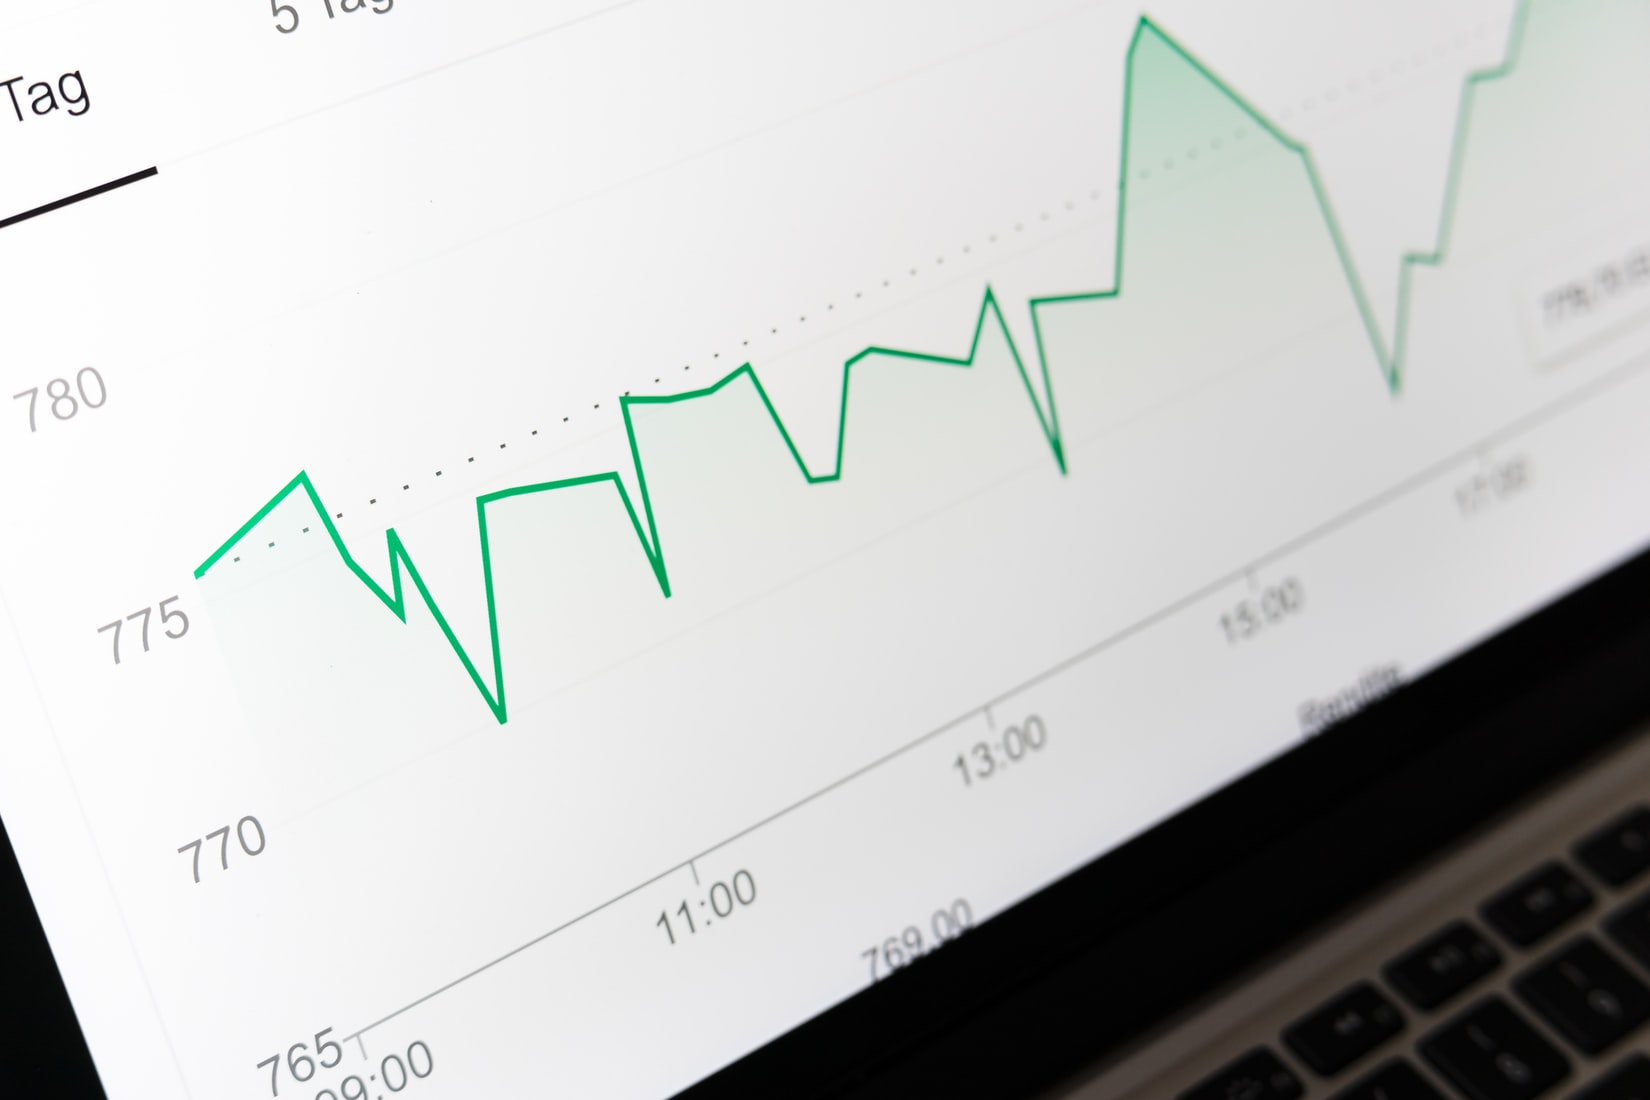 KKR & Co. Inc. Shares Near 52-Week High - Market Mover